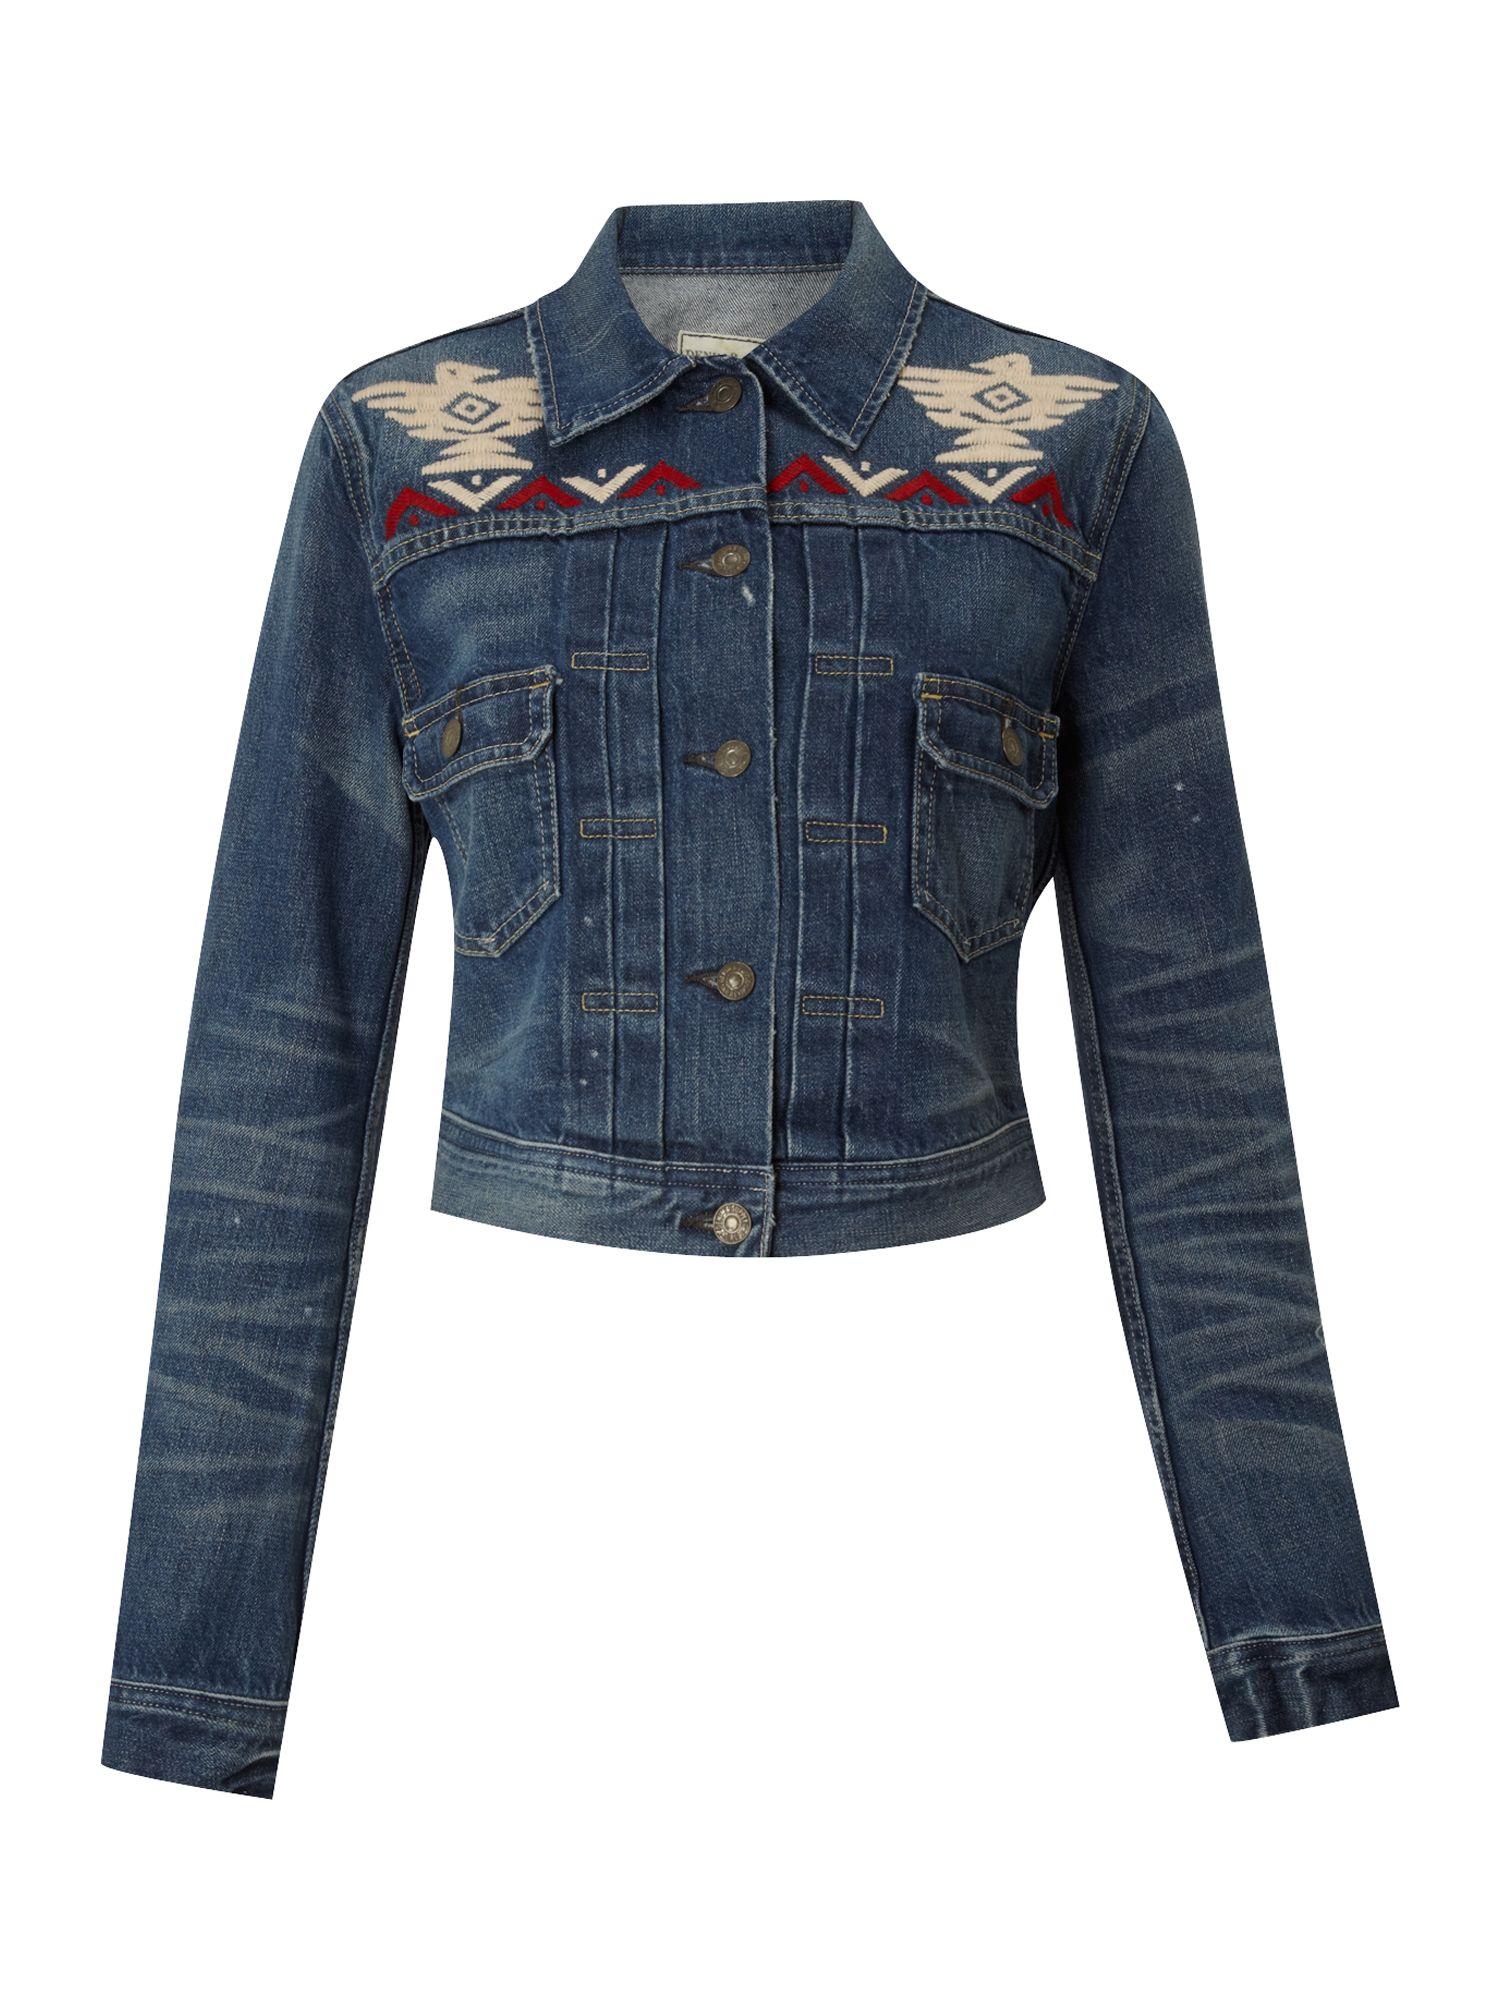 denim supply ralph lauren denim trucker jacket in blue. Black Bedroom Furniture Sets. Home Design Ideas